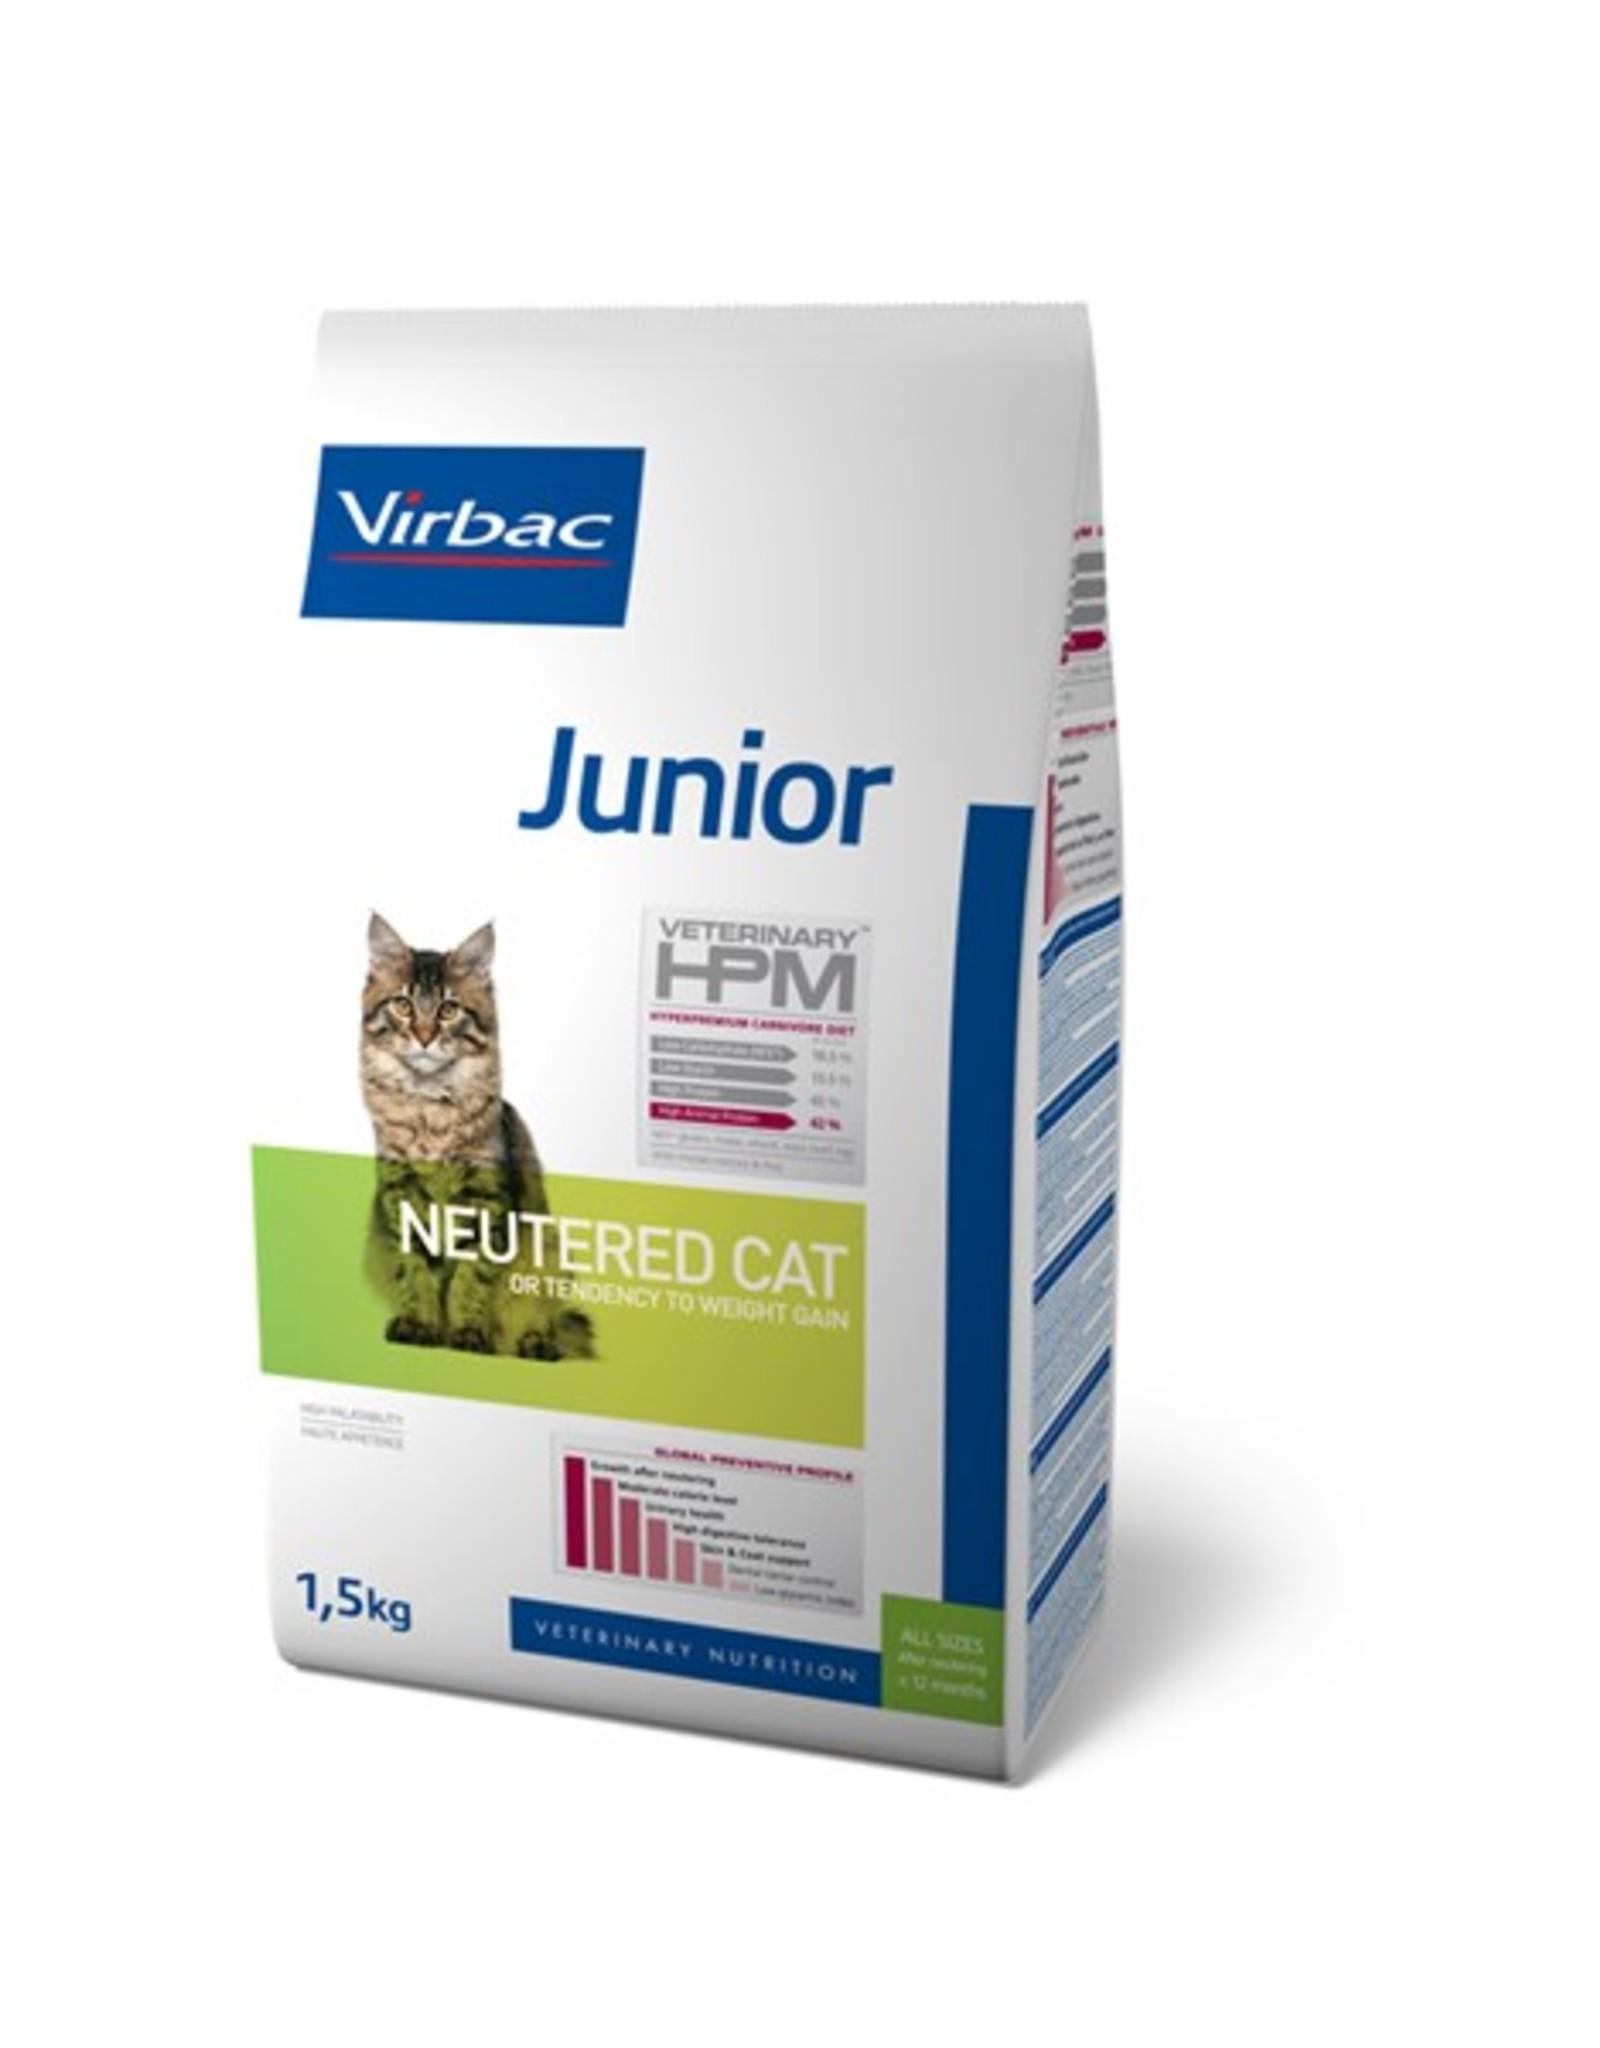 Virbac Virbac Hpm Kat Neutered Junior 1,5kg